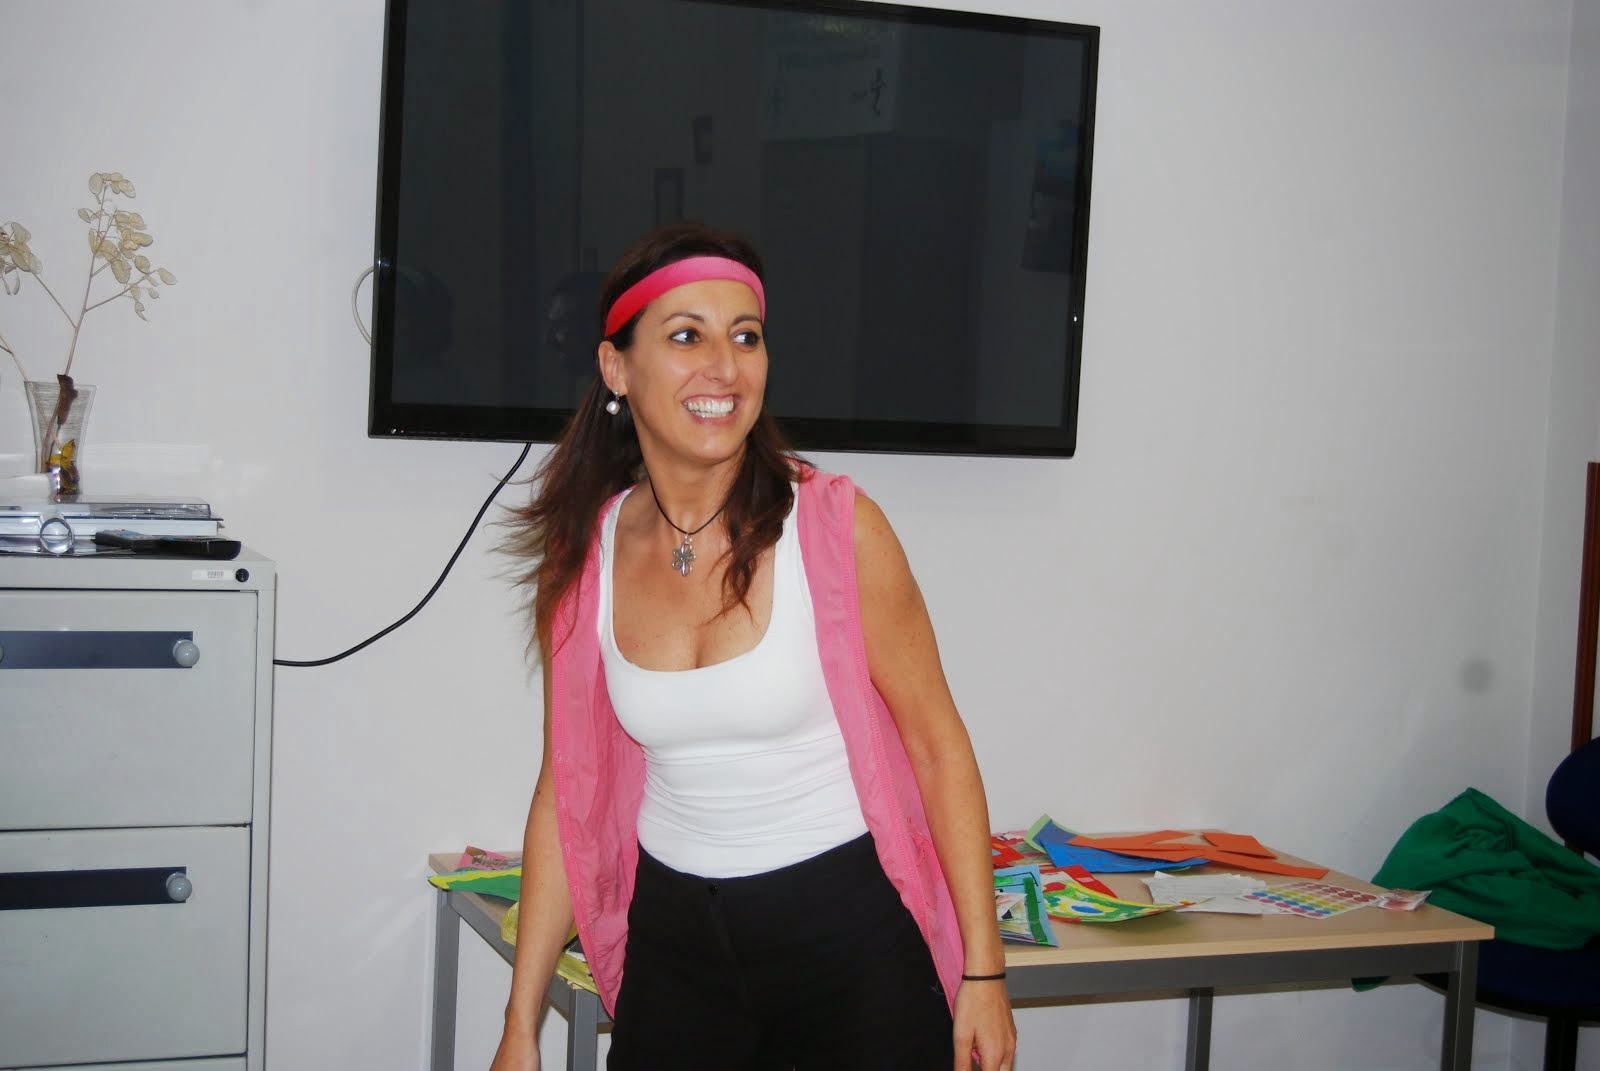 Marta Salvat